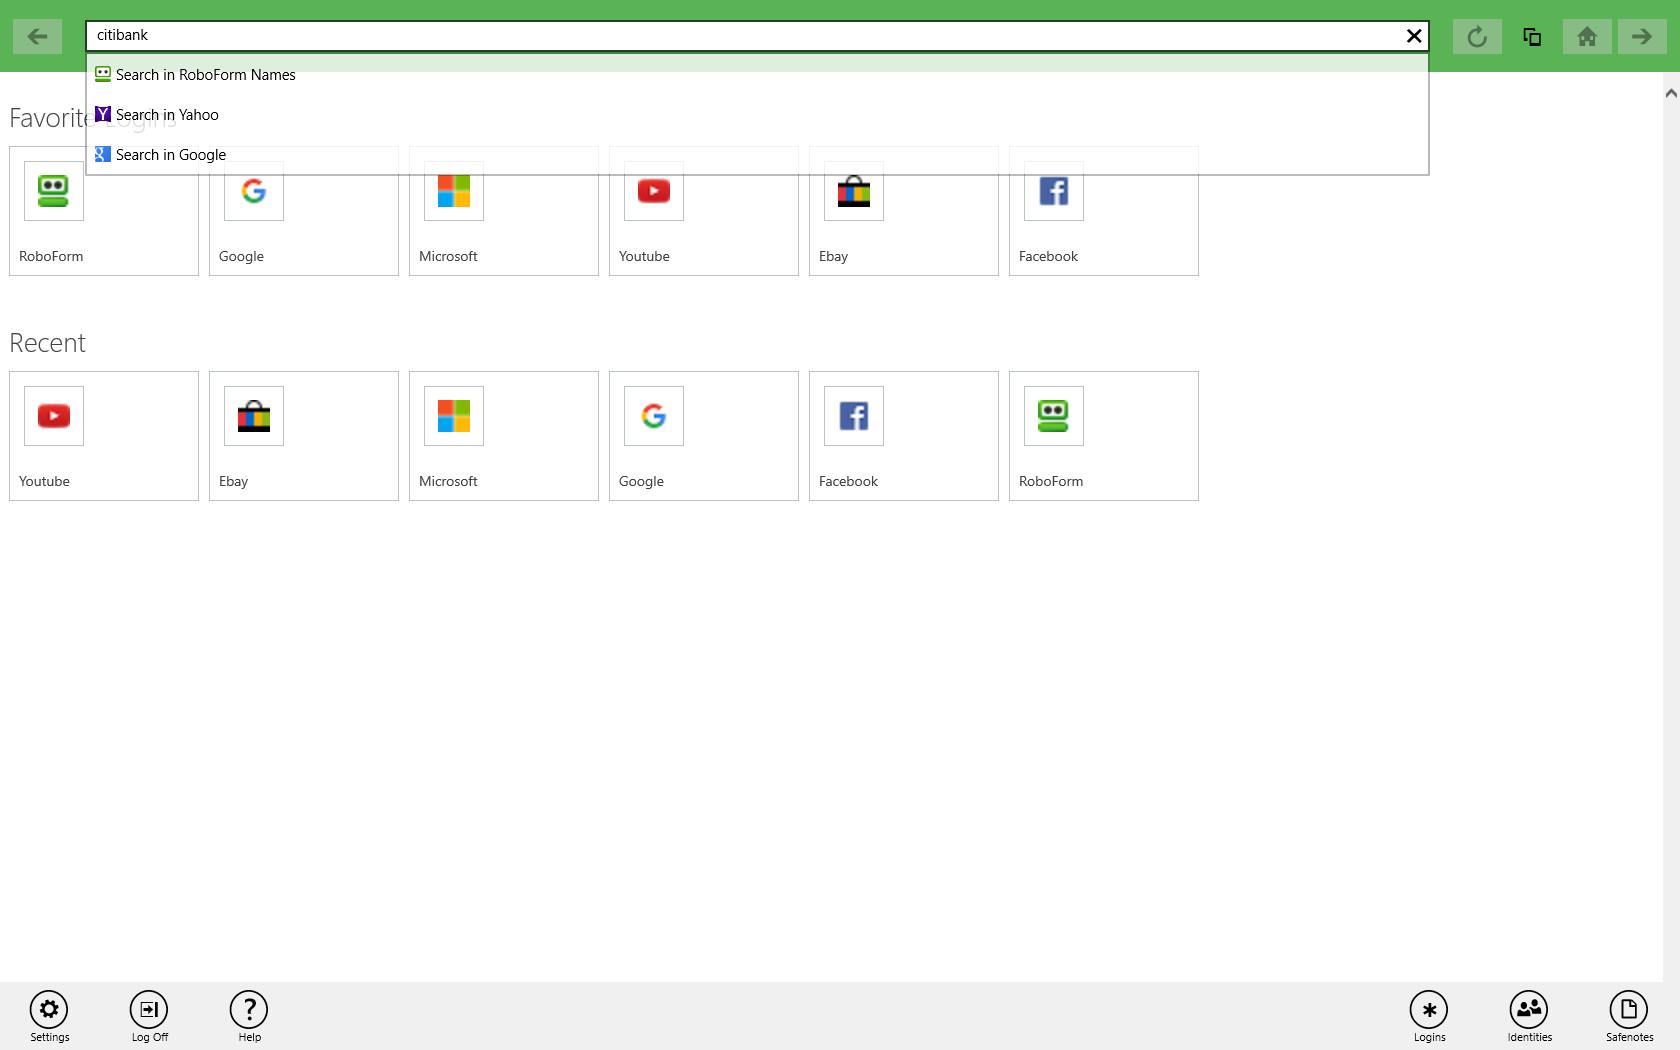 RoboForm for Windows Phone / RT